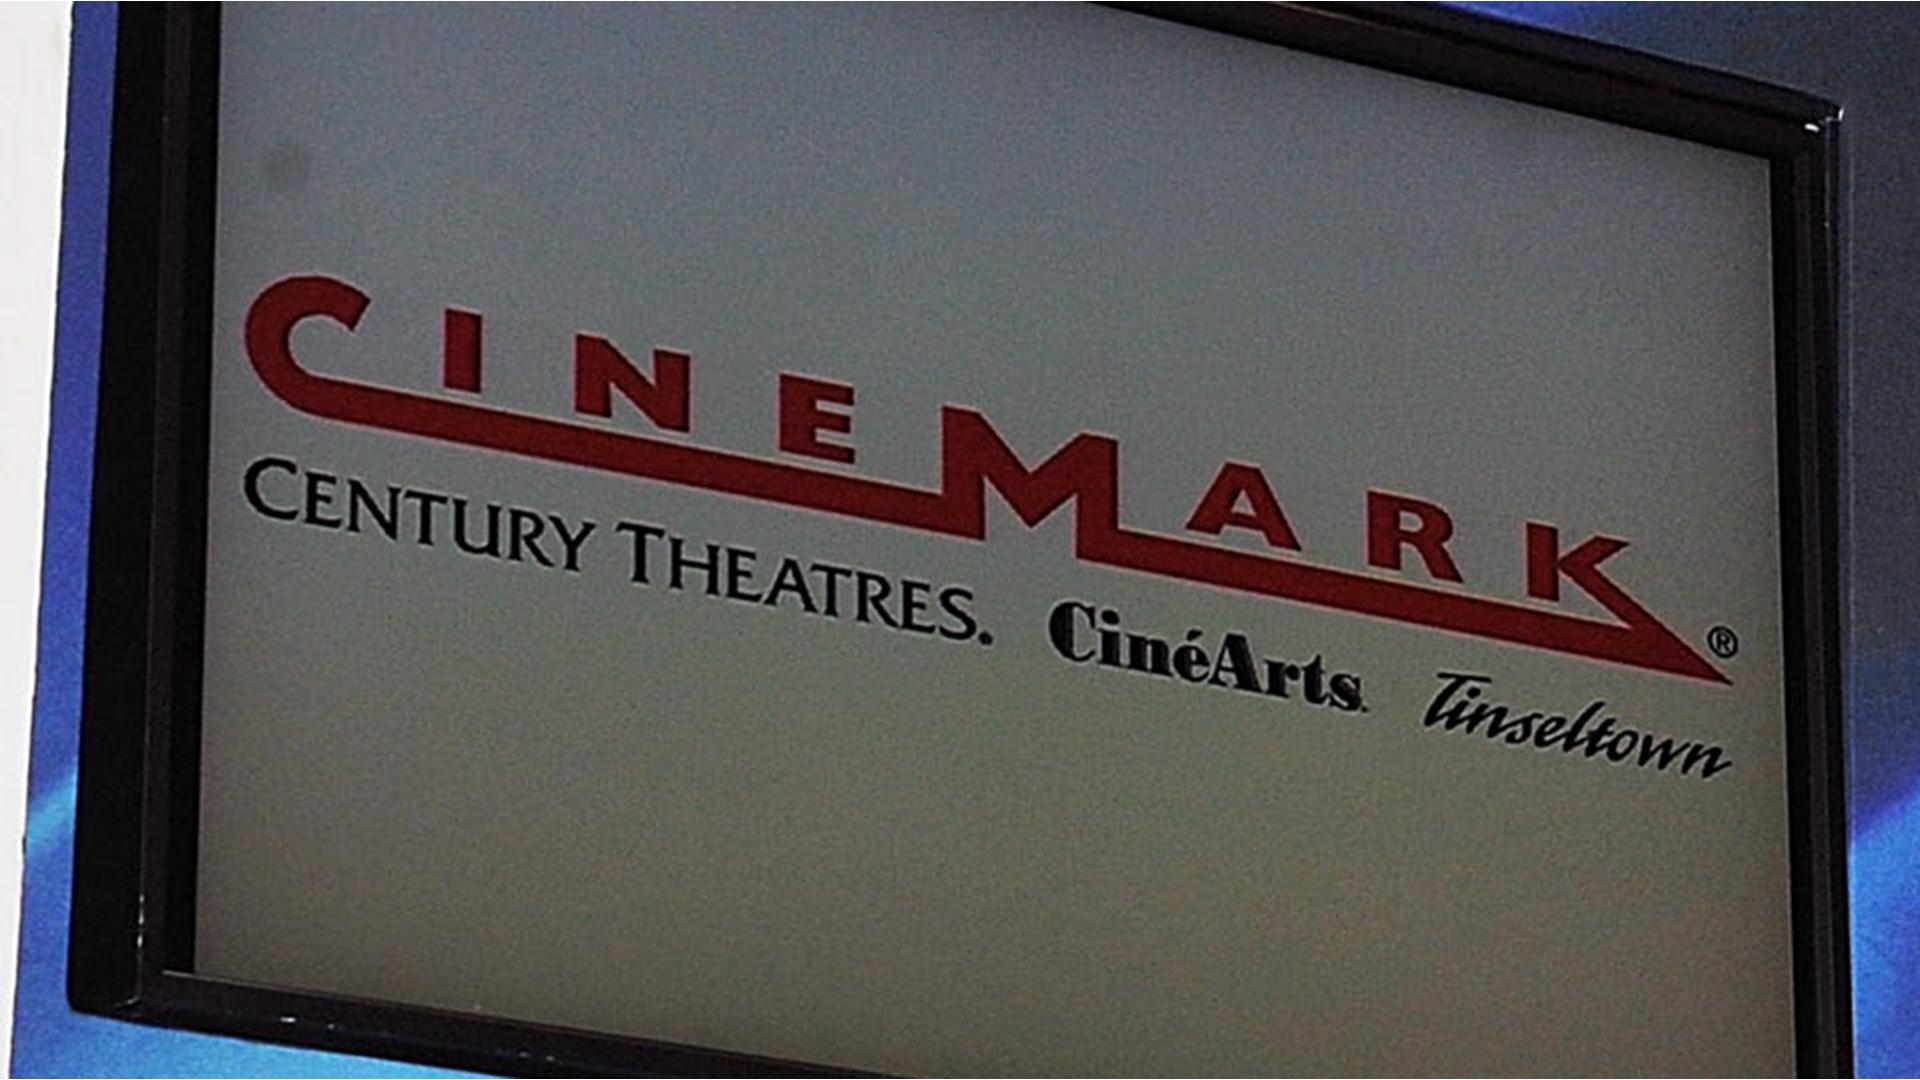 Cinemark movie theater sign-159532.jpg40822542